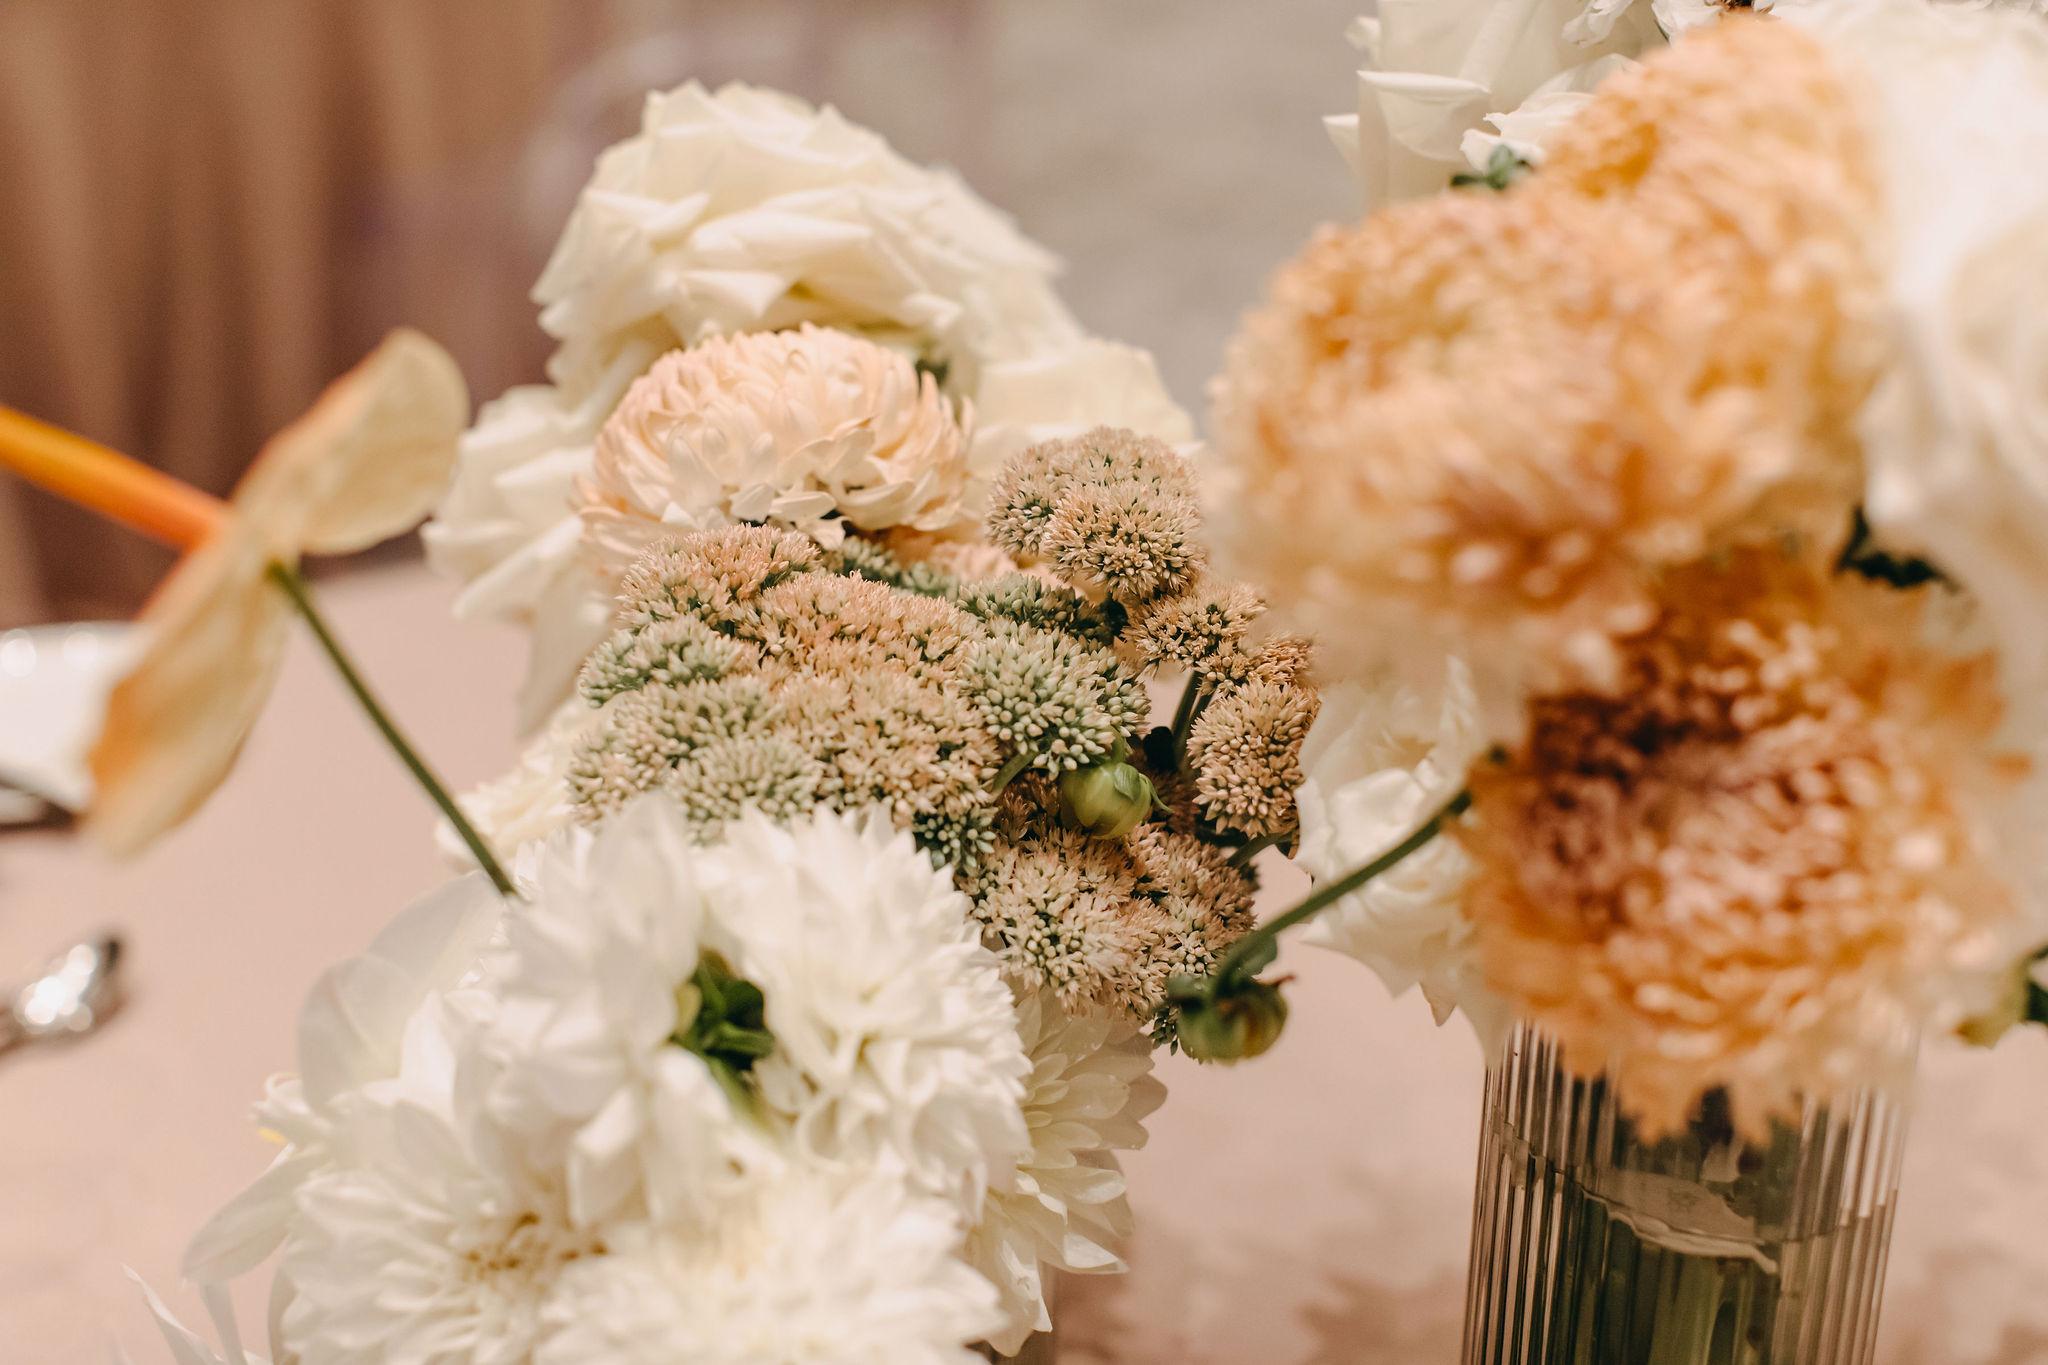 75-FOX&RABBIT-WEDDINGOPENDAY-THEWESTIN-15FEB2020